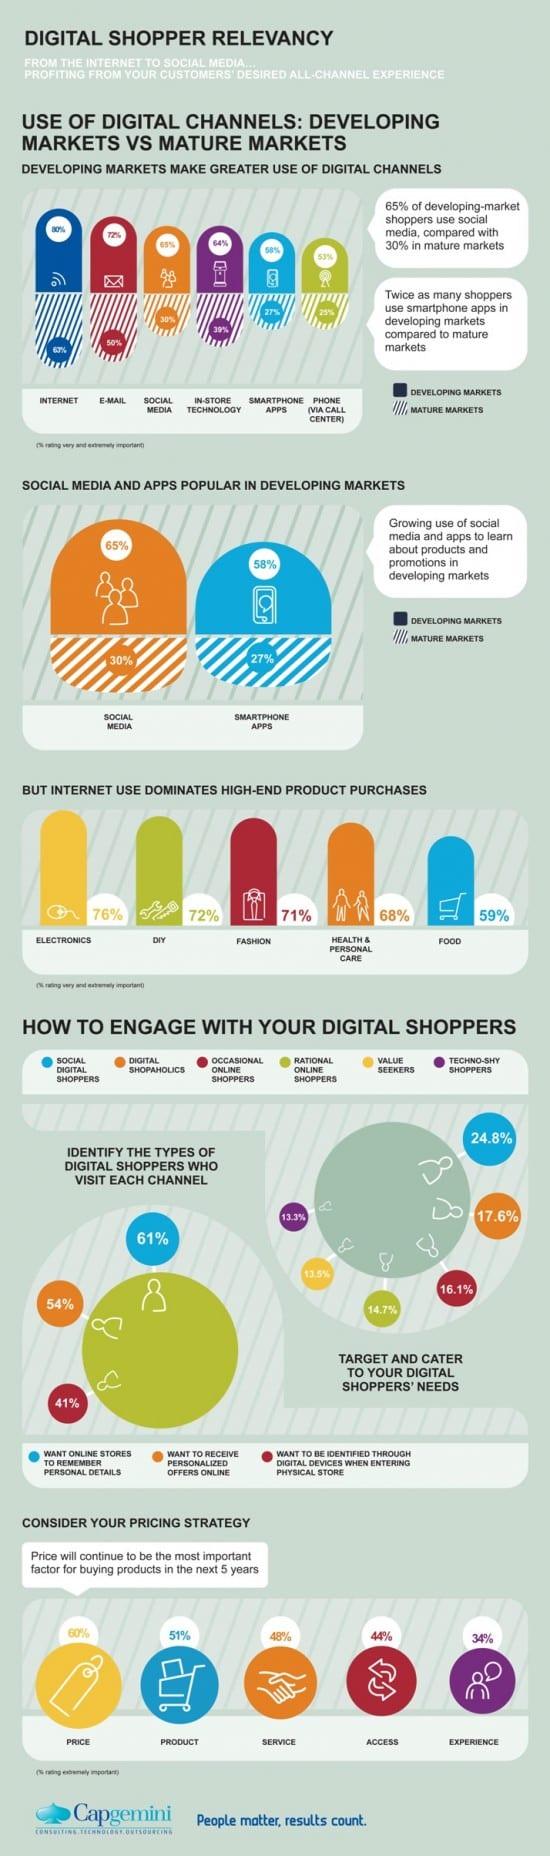 Digital Shopper Relevance Infographic